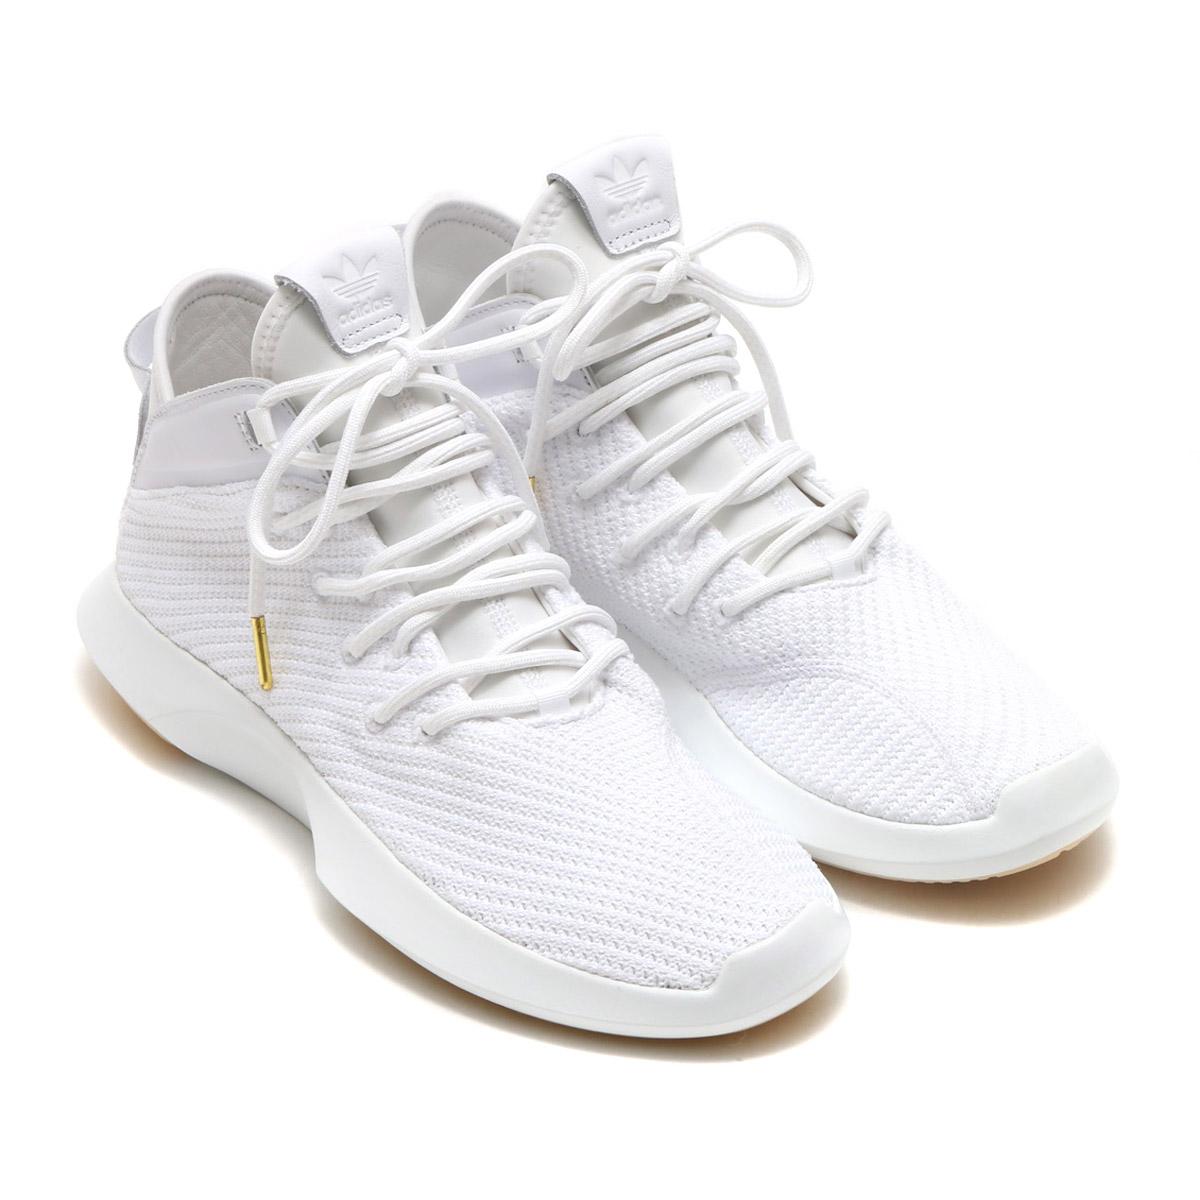 adidas Originals CRAZY 1 ADV PK (アディダス オリジナルス クレイジー 11ADV PK)Running White/Core Black/Gold Mett【メンズ スニーカー】17FW-I